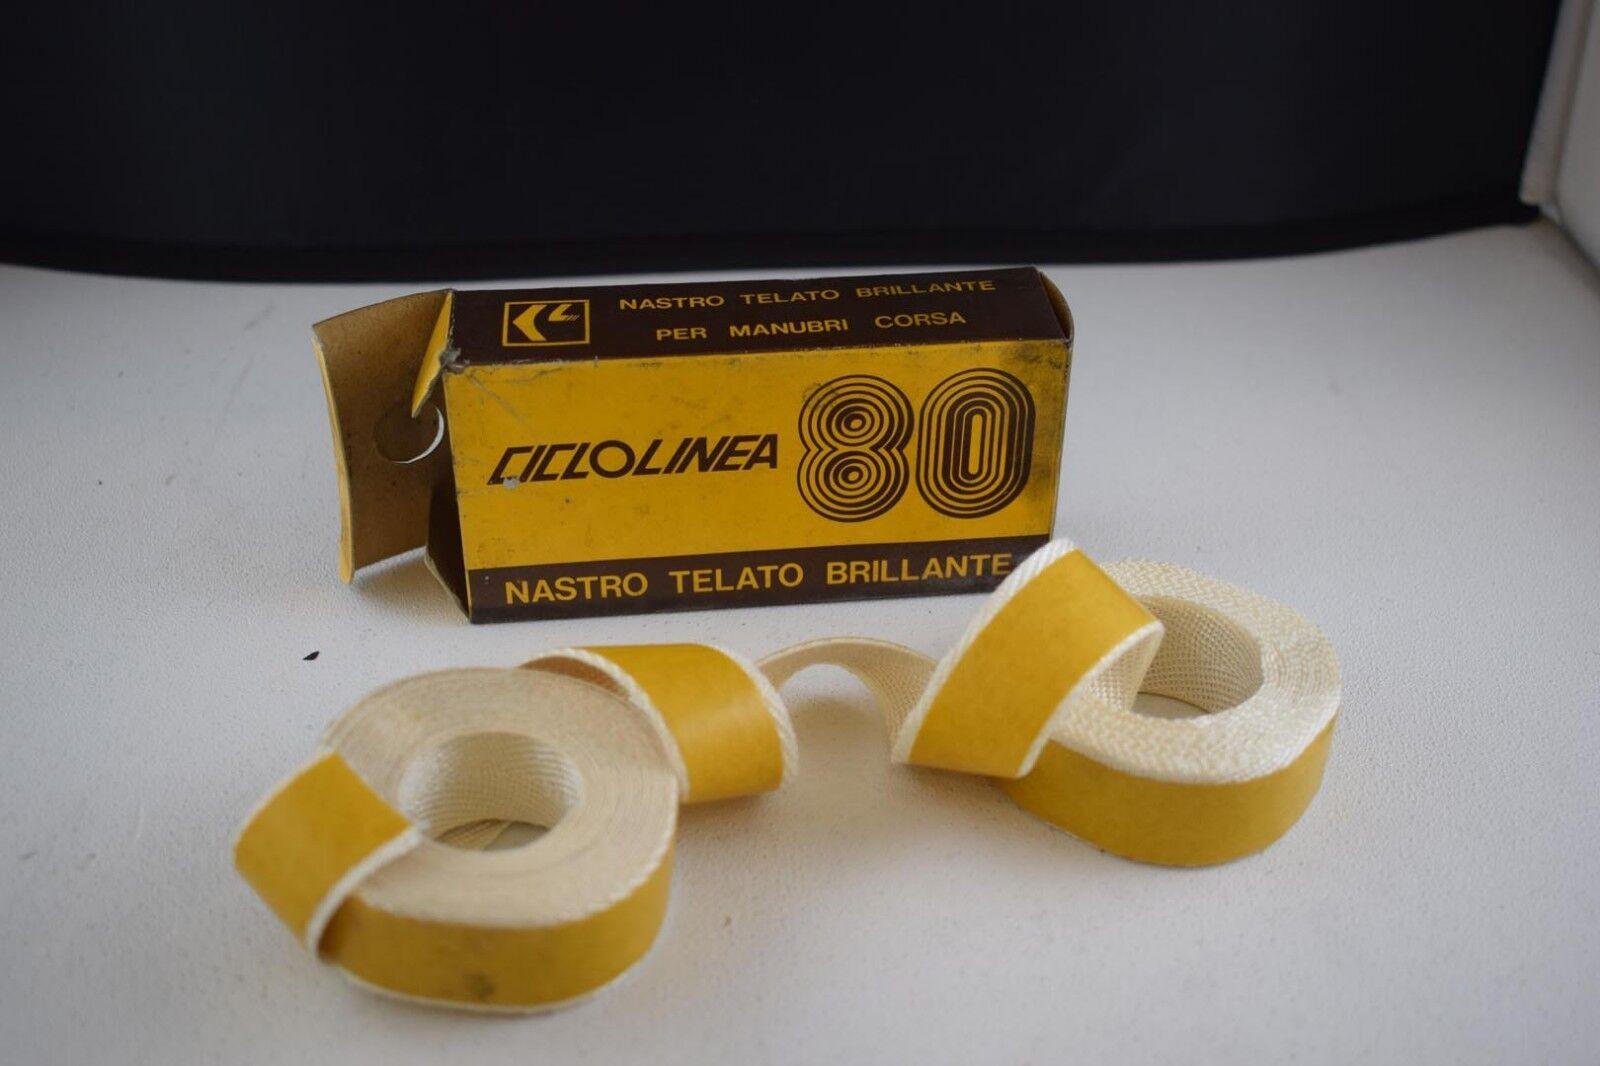 CICLOLINEA 80 Cotton handlebar grip tape set white 80s Vintage NIB NOS